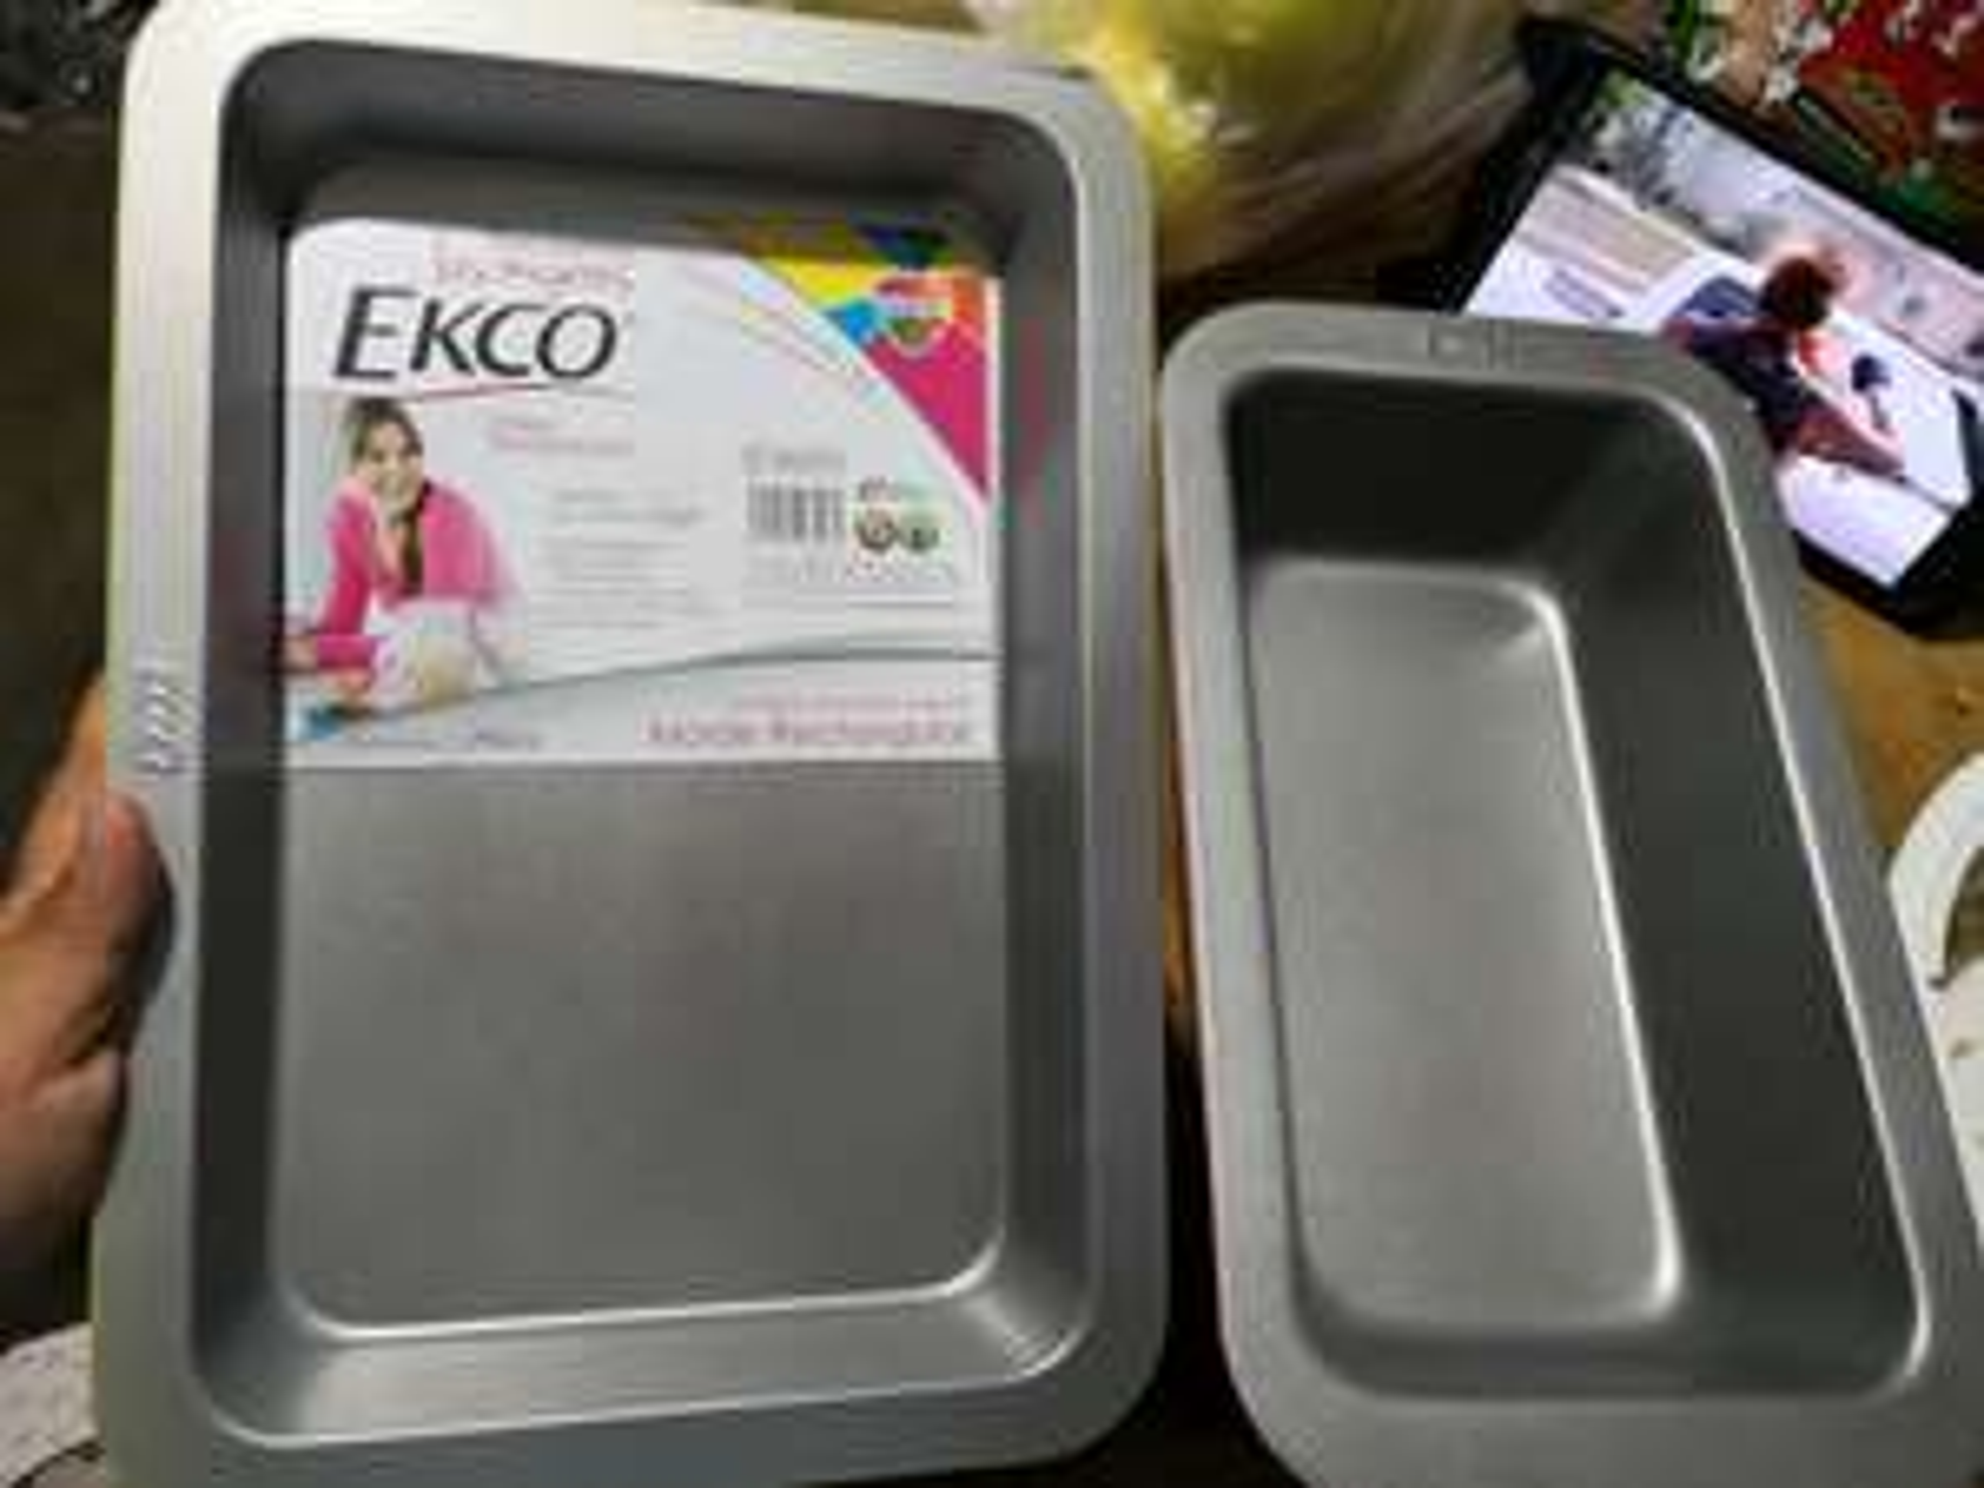 Walmart: Moldes para hornear ecko diferentes tamaños colores pastel